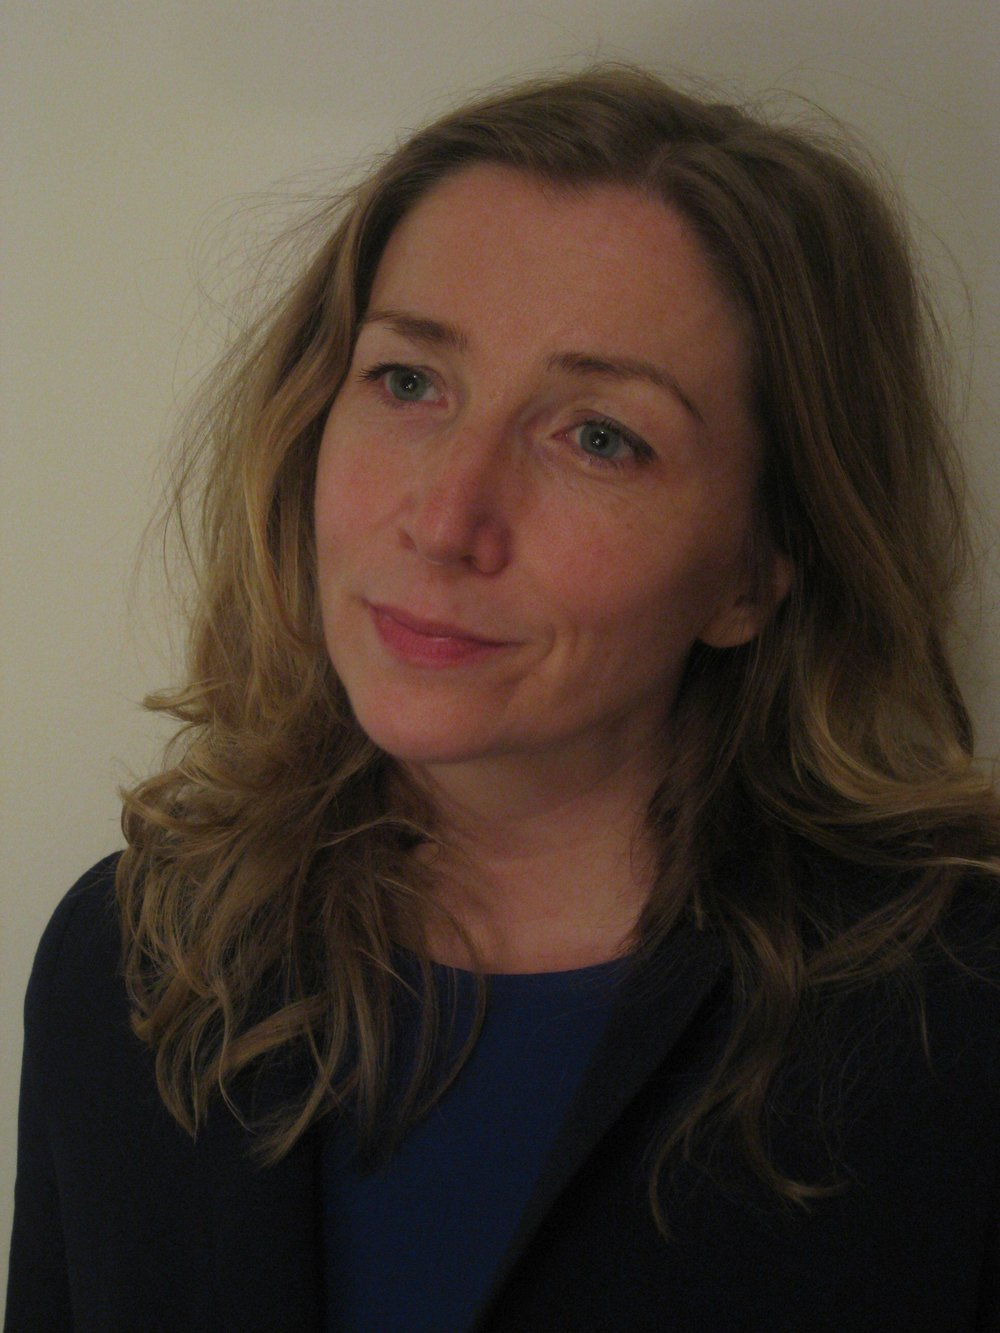 Nathalie Risse